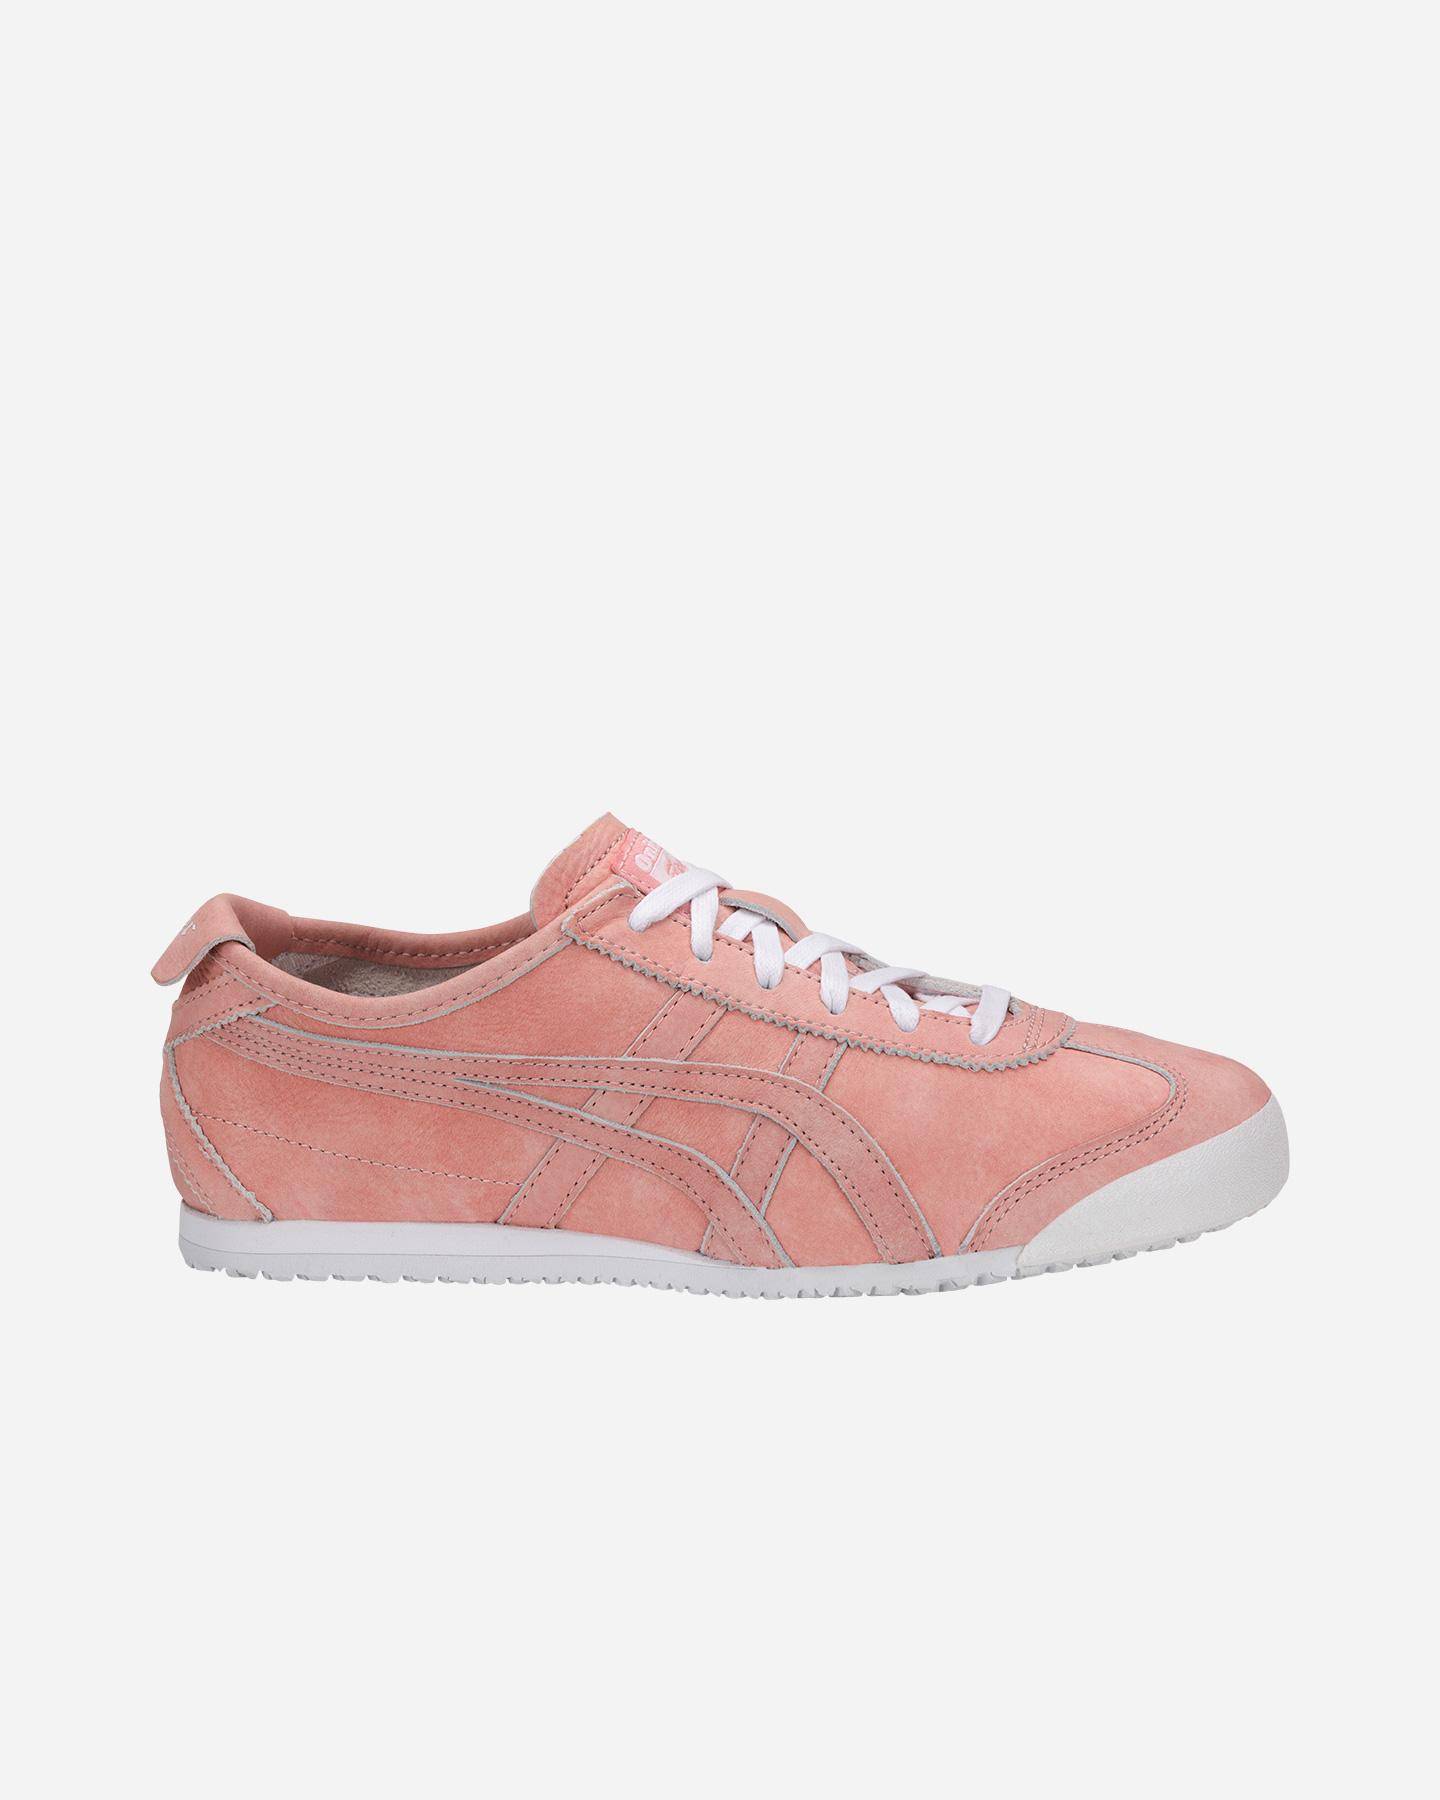 7731688260 Scarpe Sneakers Asics Tiger Mexico 66 W D8D0L-0505 | Cisalfa Sport